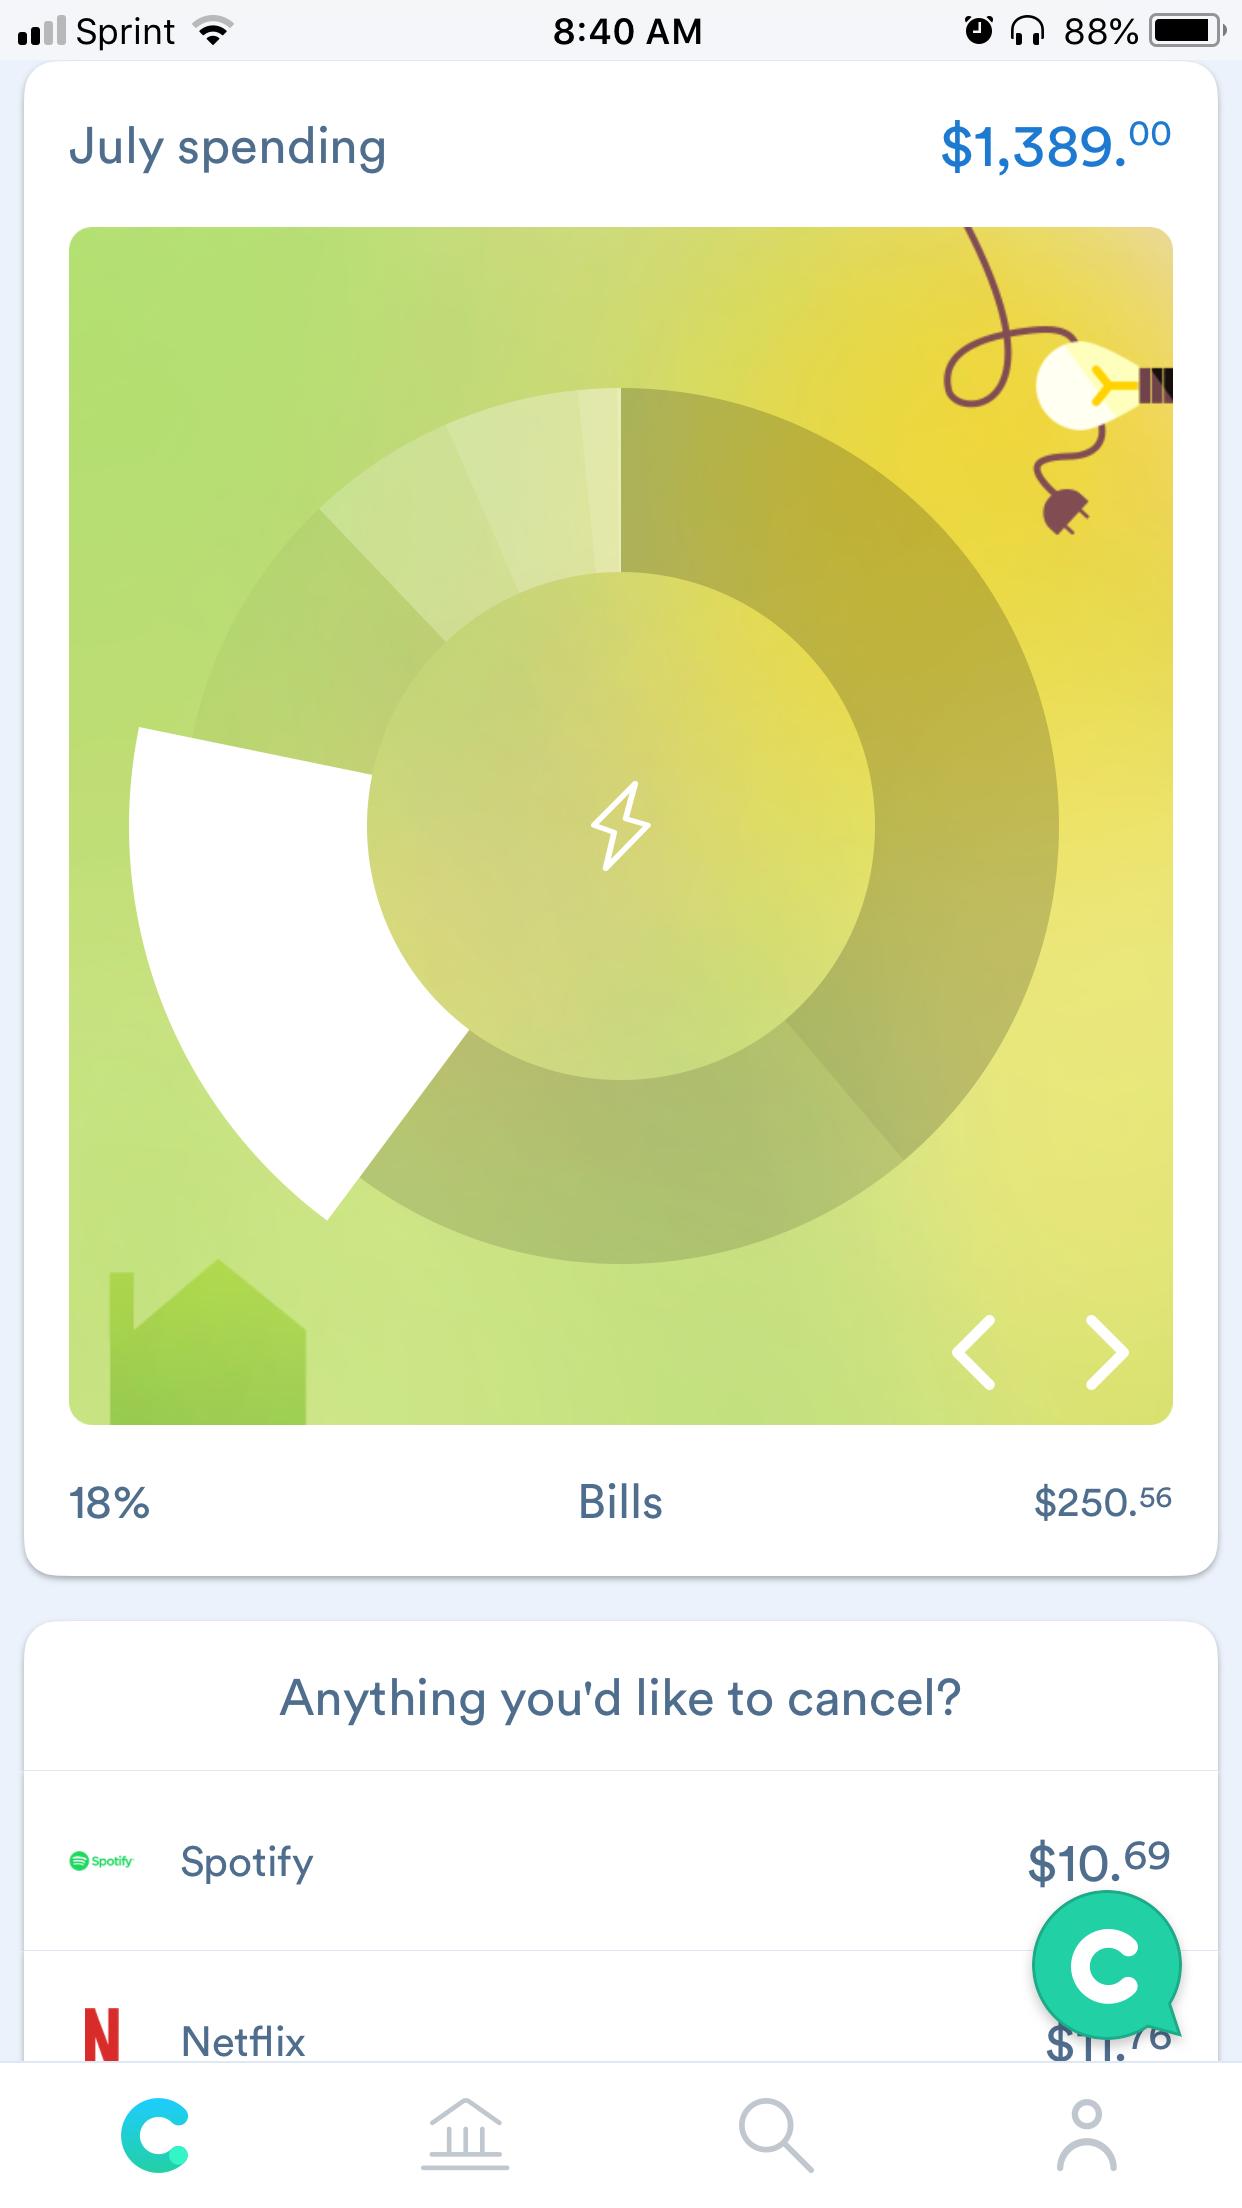 Clarity - Spending Categories Chart